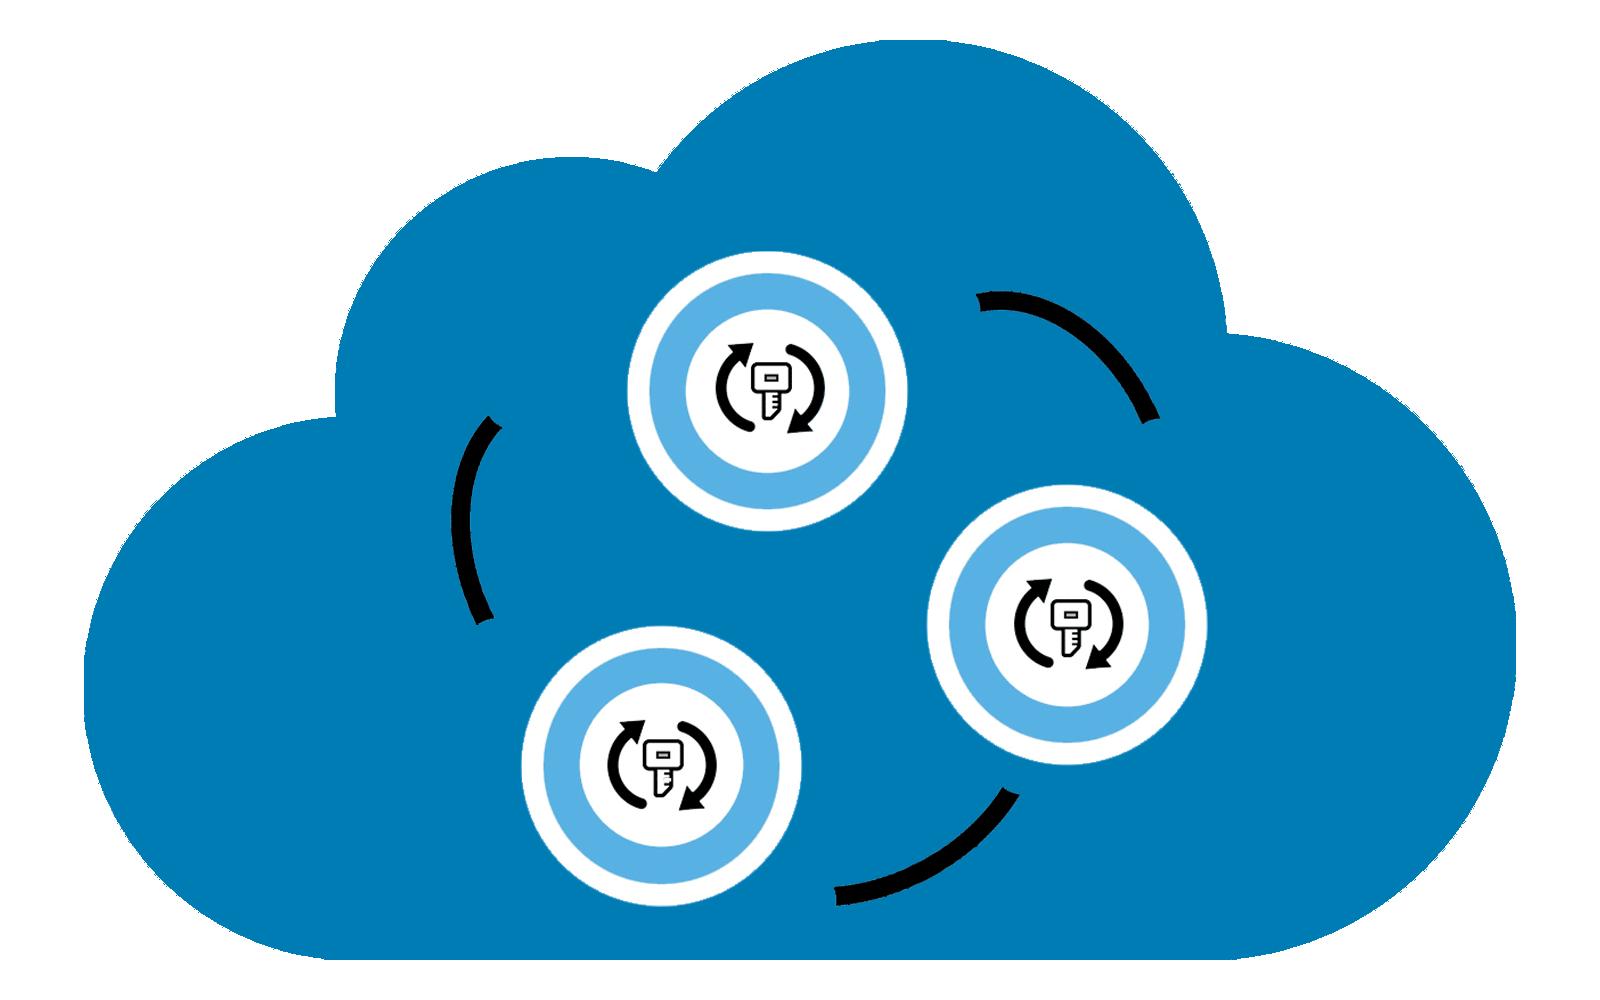 Cloud based software licensing solution